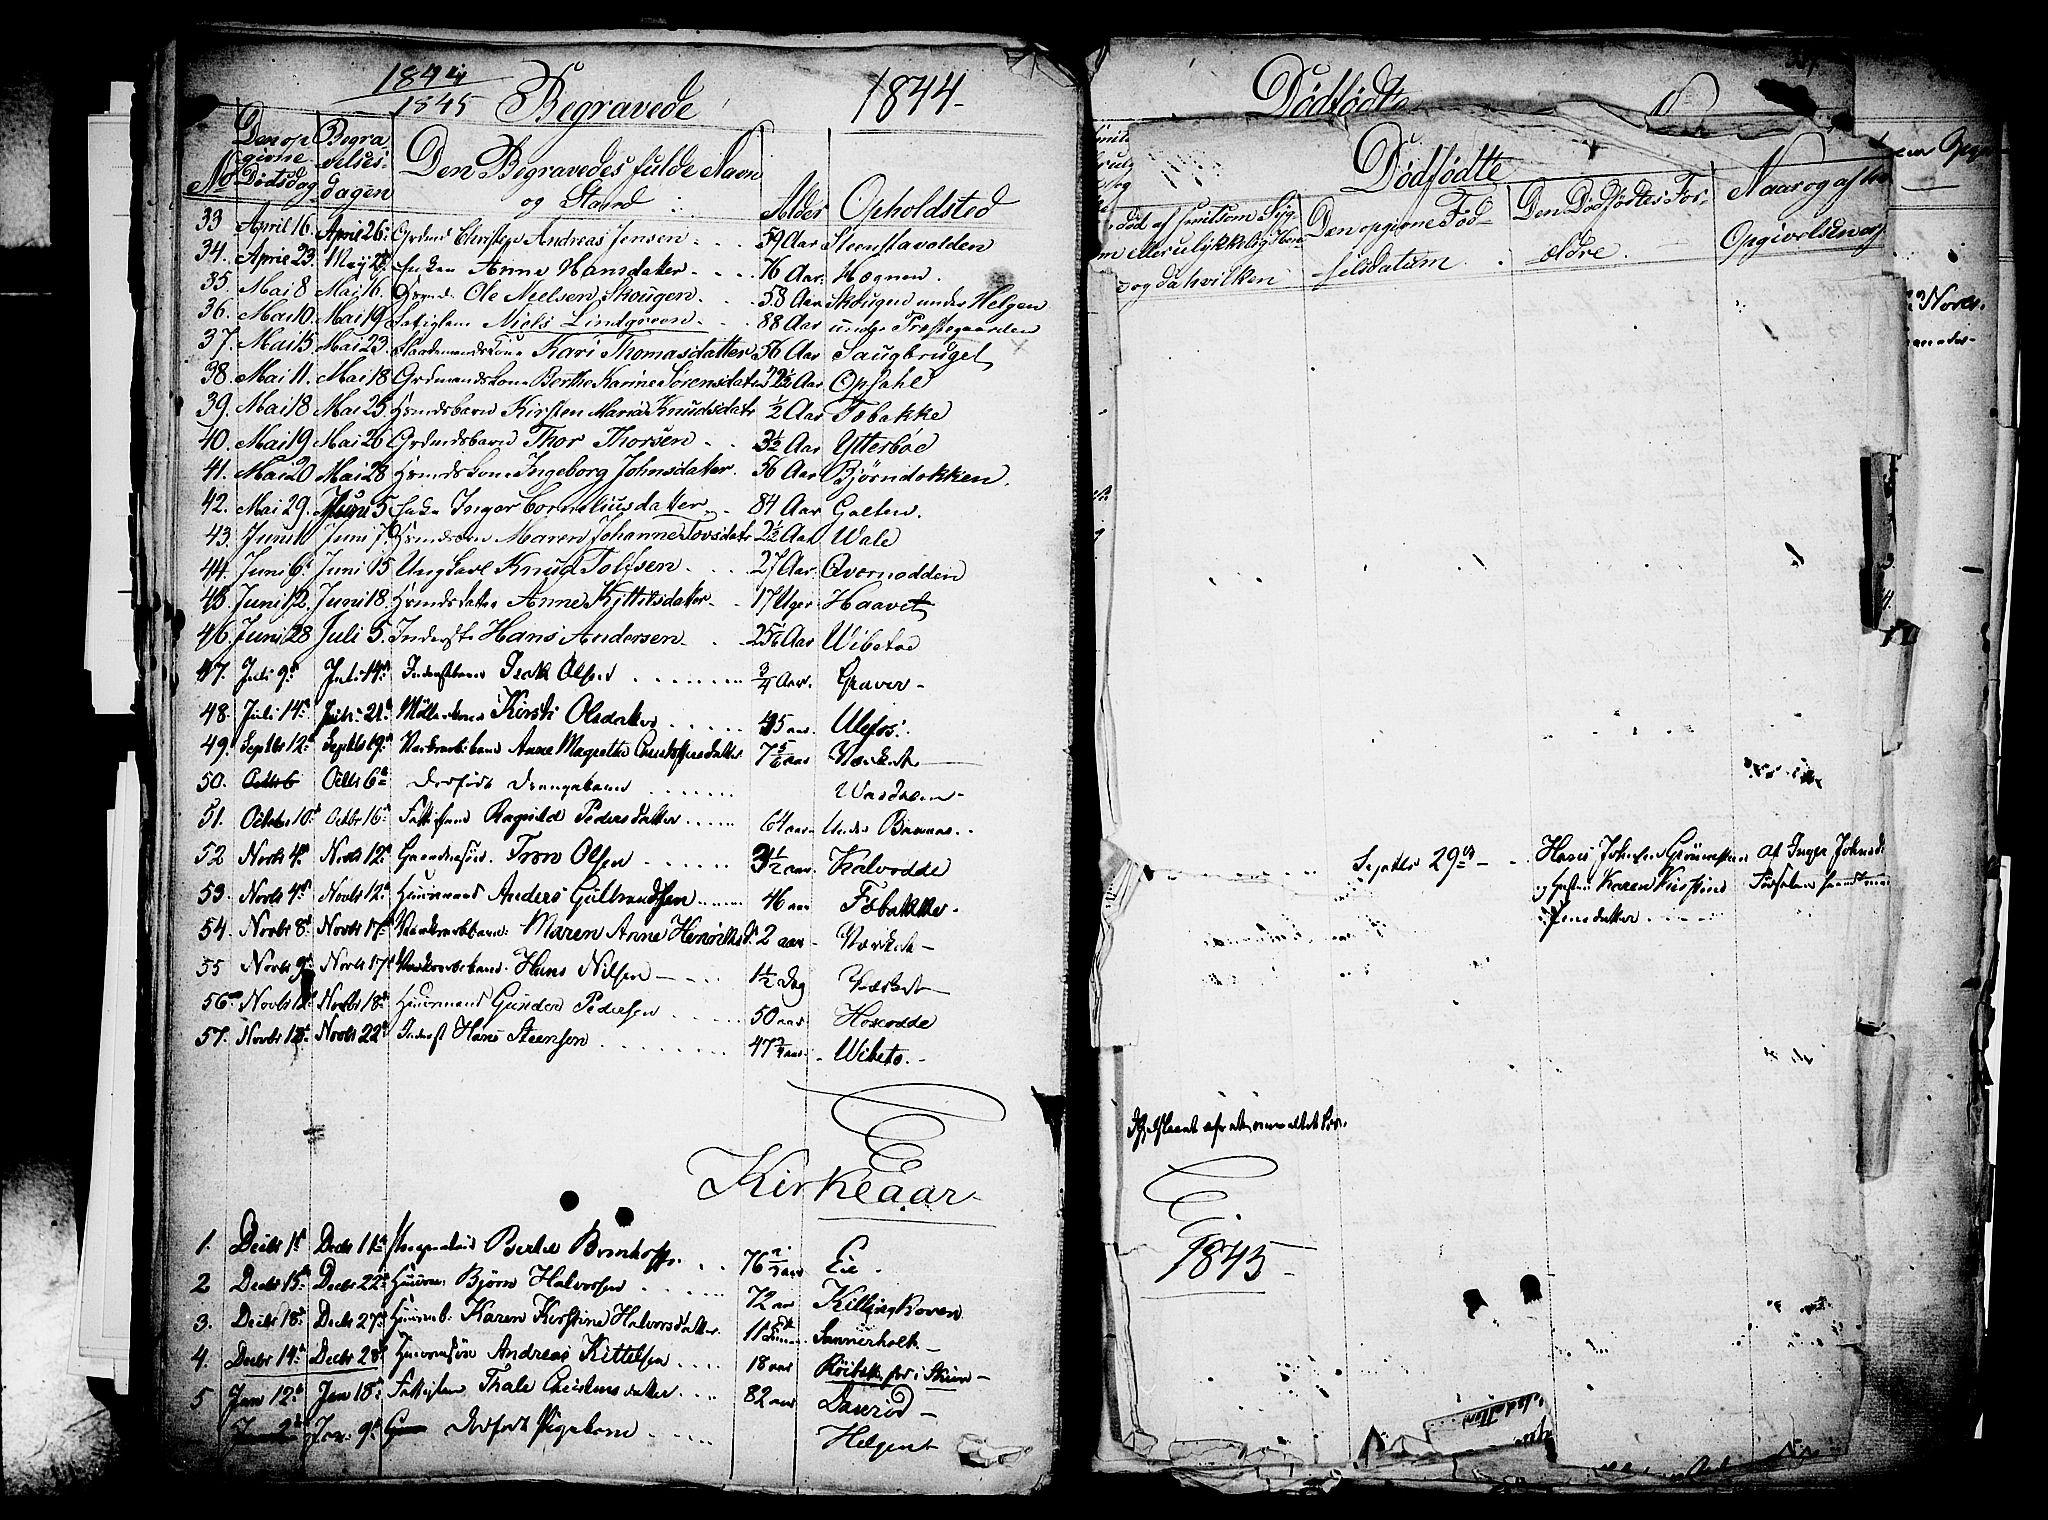 SAKO, Holla kirkebøker, F/Fa/L0004: Ministerialbok nr. 4, 1830-1848, s. 386